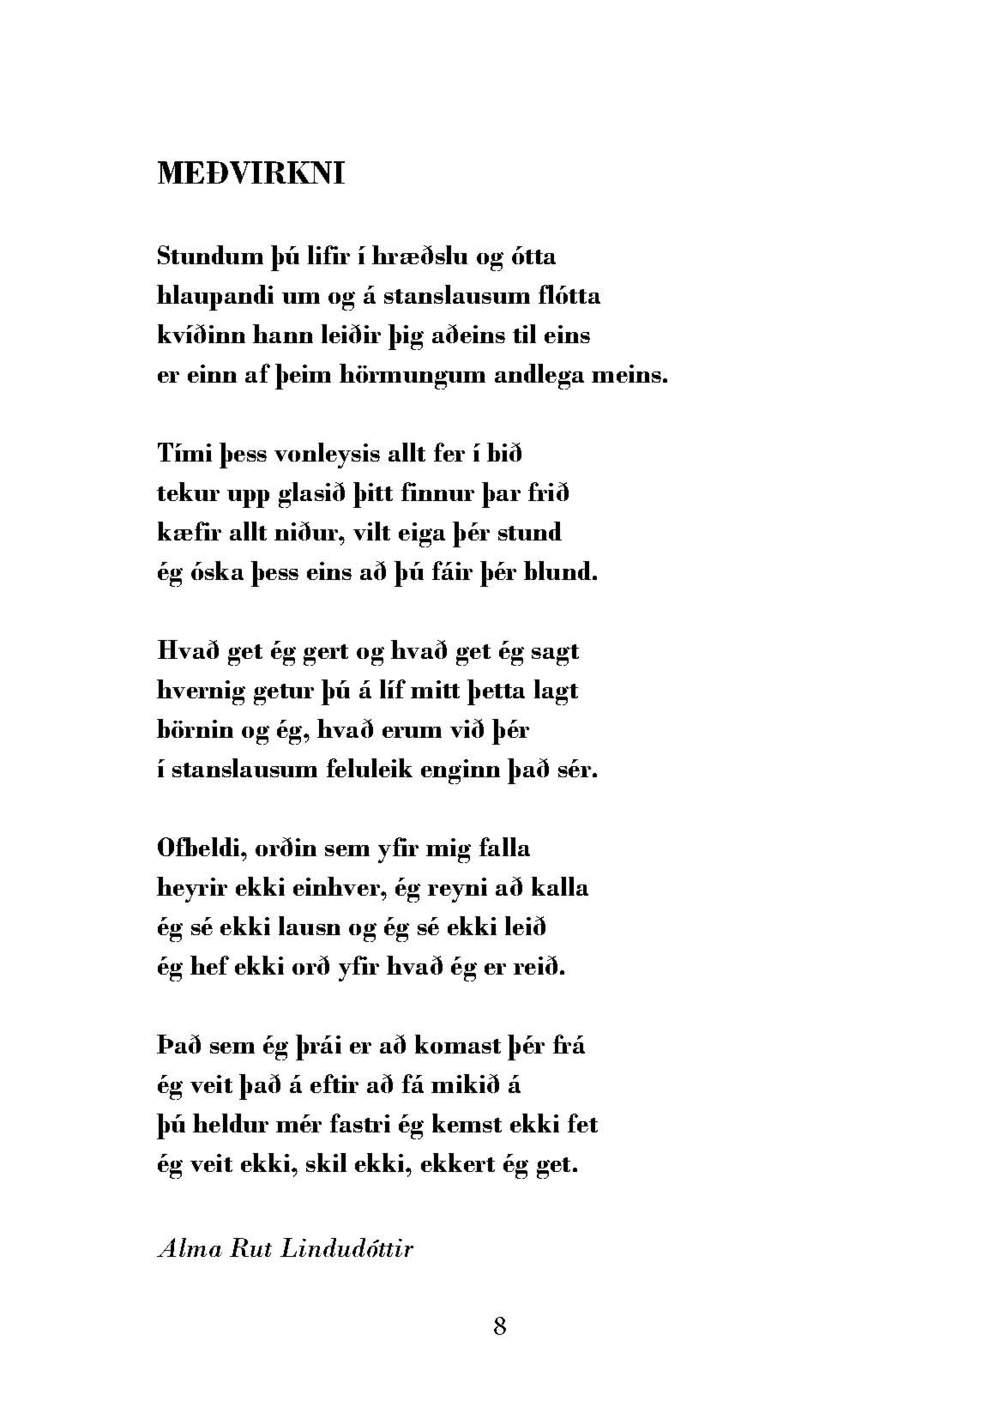 27073-ljodabokin--oll_Page_23.jpg